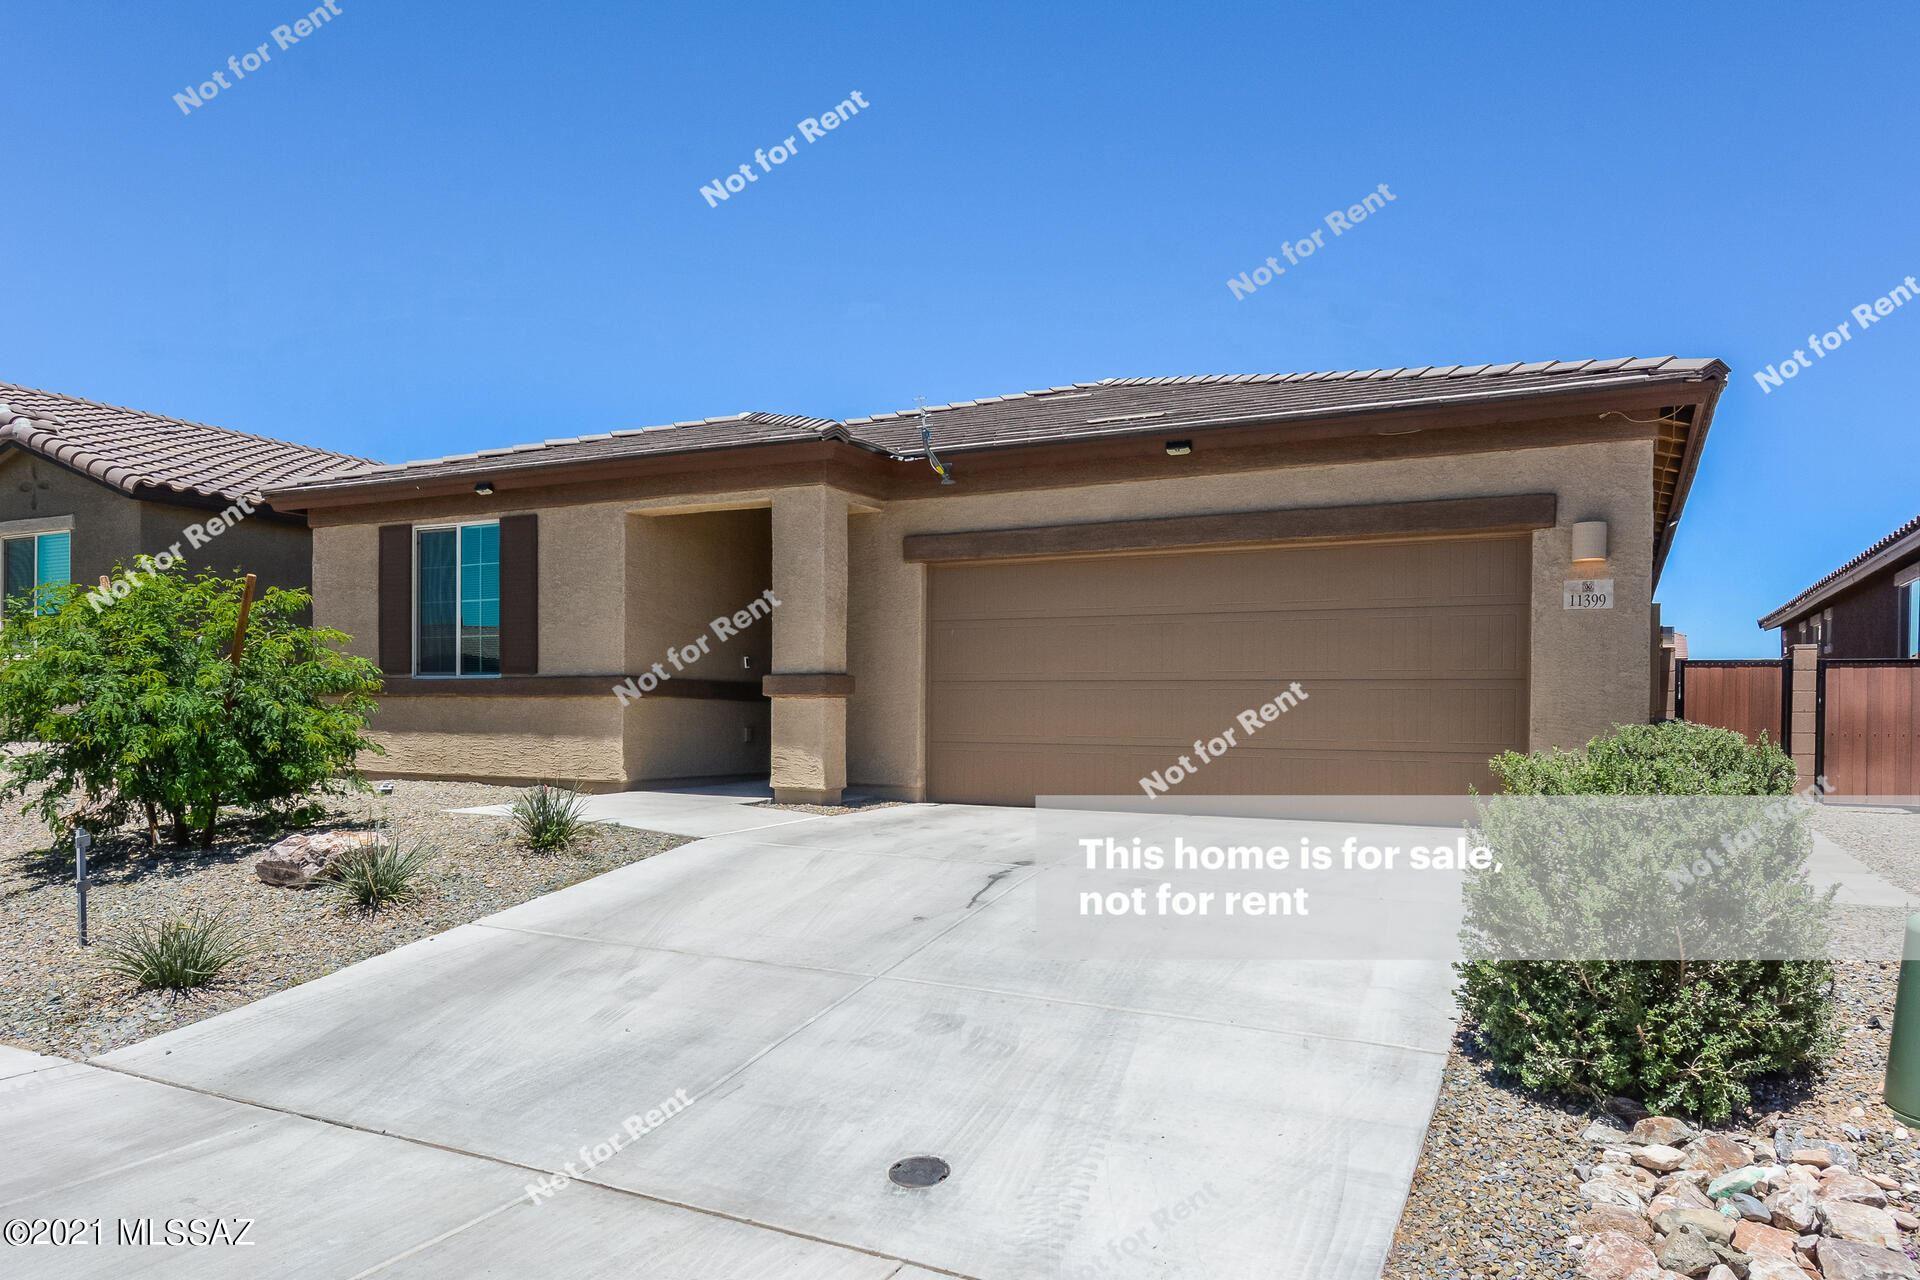 11399 E Vail Crest Drive, Tucson, AZ 85747 - MLS#: 22115275